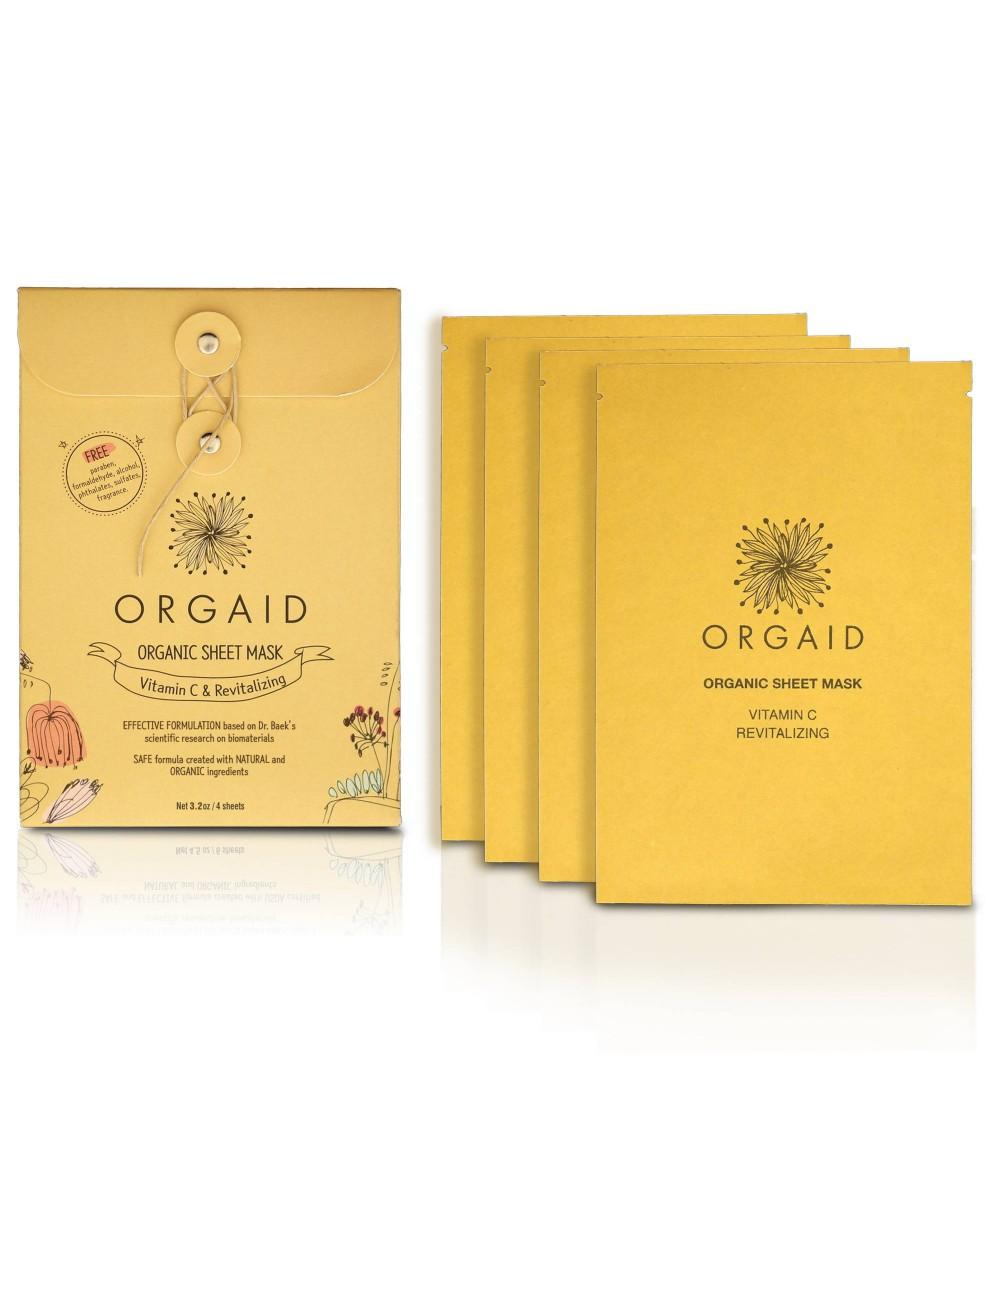 ORGAID Organic Sheet Mask - Vitamin C & Revitalizing 4 Sheets